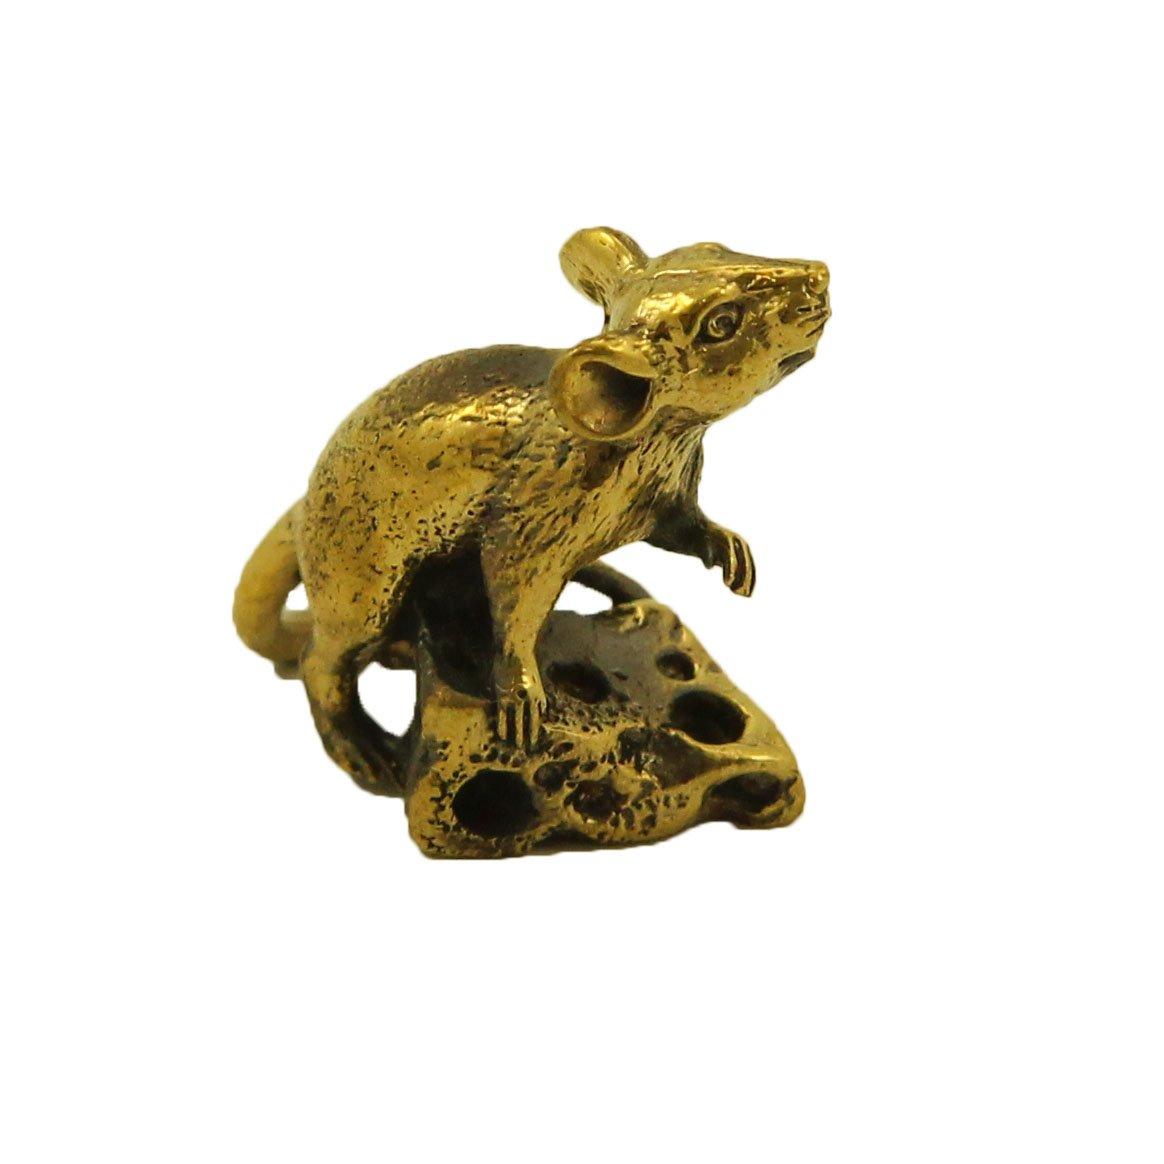 CTOC Rat Bronze small Statuette Handmade Figurine Souvenir